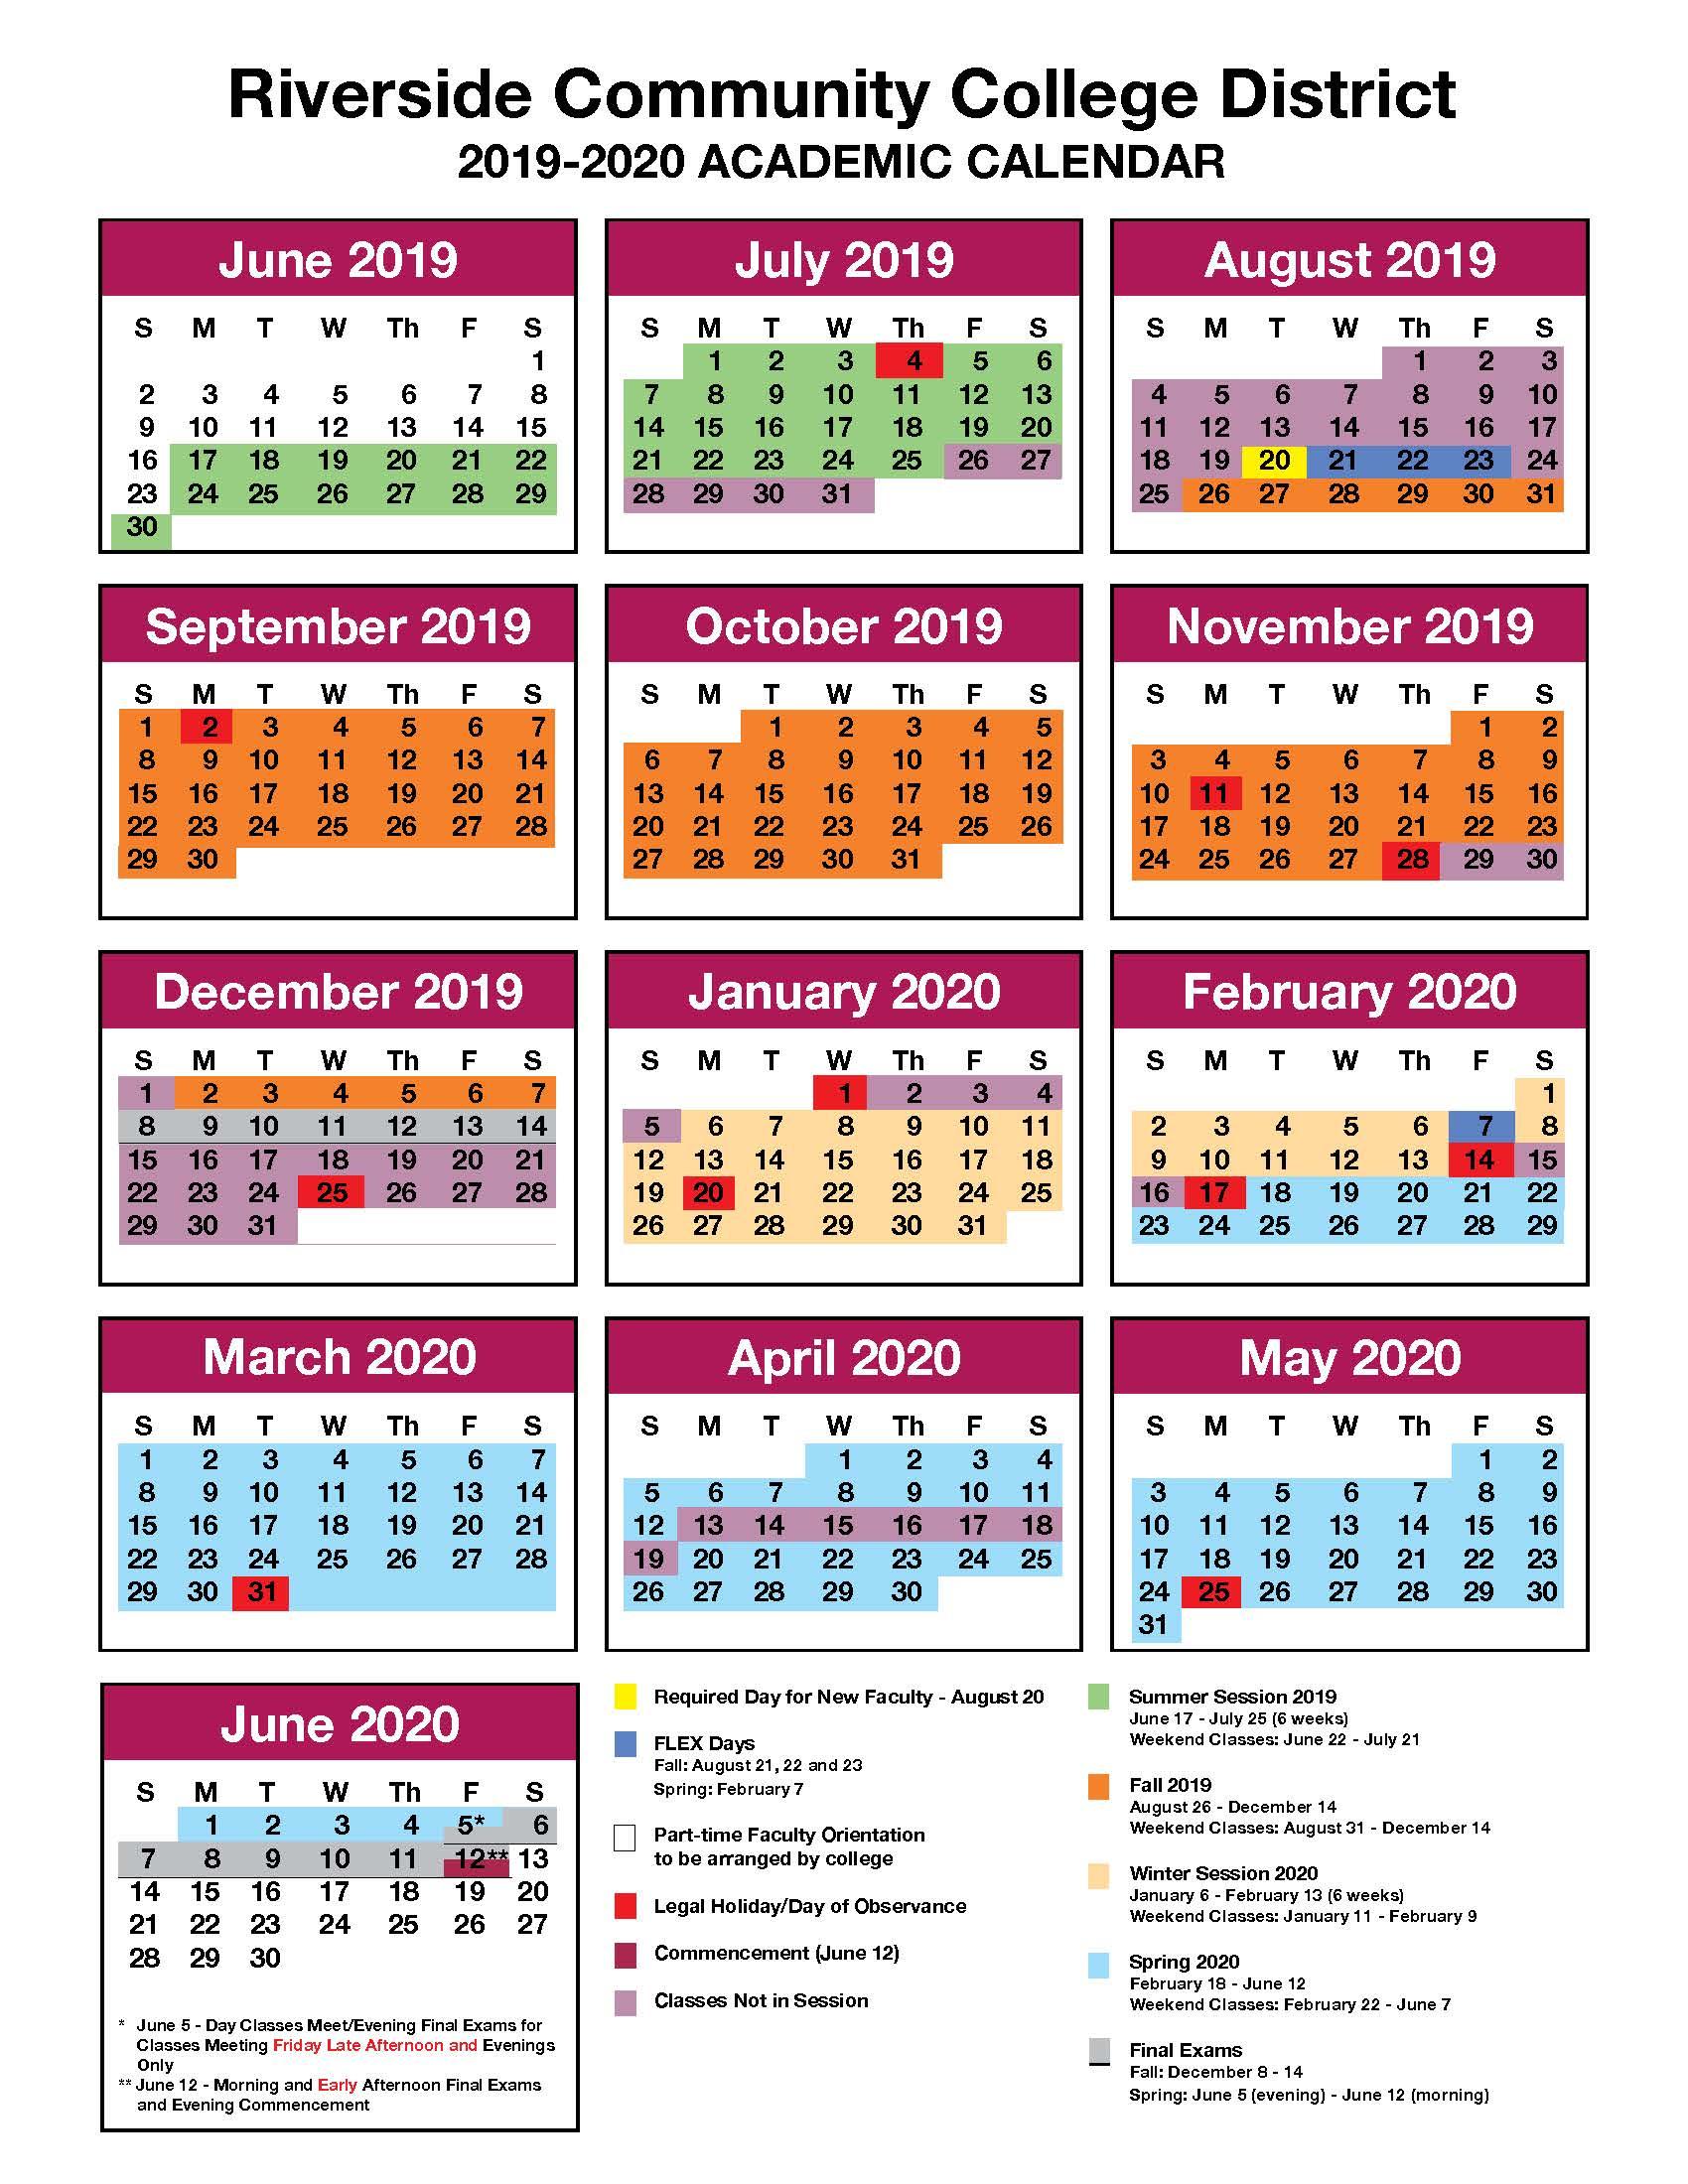 Jfk And Norco College Calendar 2019 2020 - John F. Kennedy Intended For University Of Redlands Academic Calendar 2020